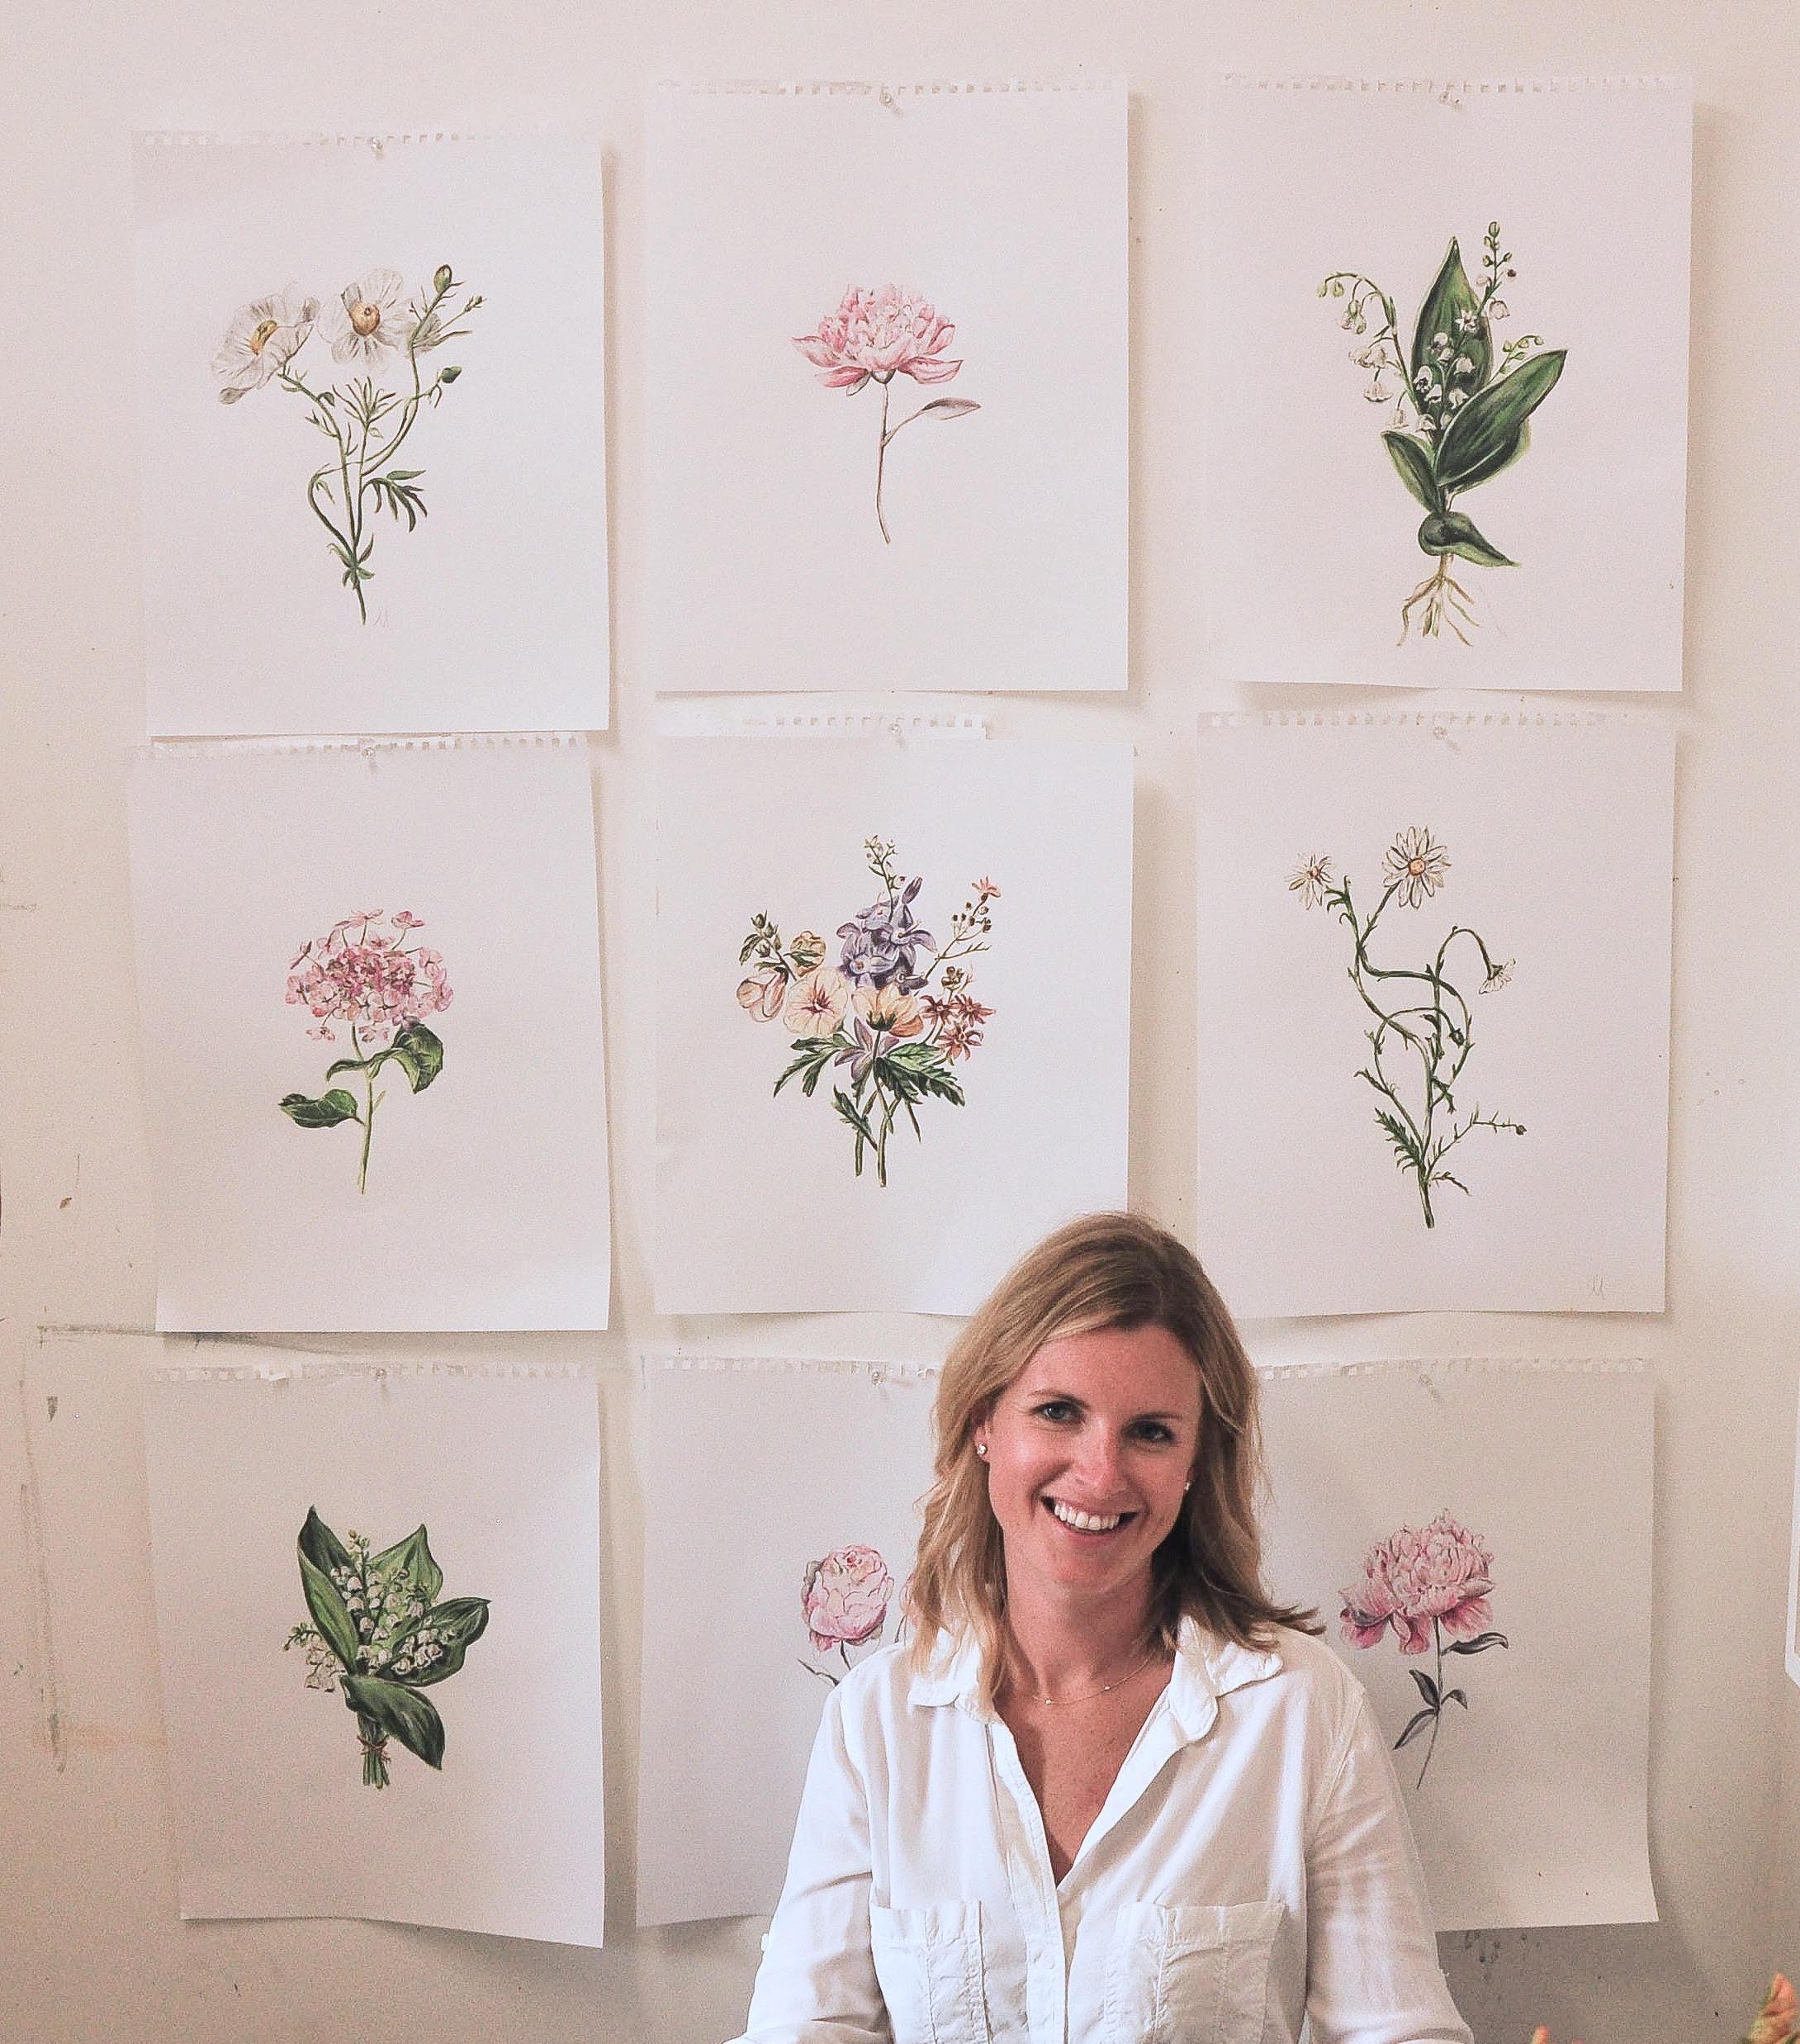 Savannah-based Acrylic Painter and Resin Artist, Mary Margaret Monsees